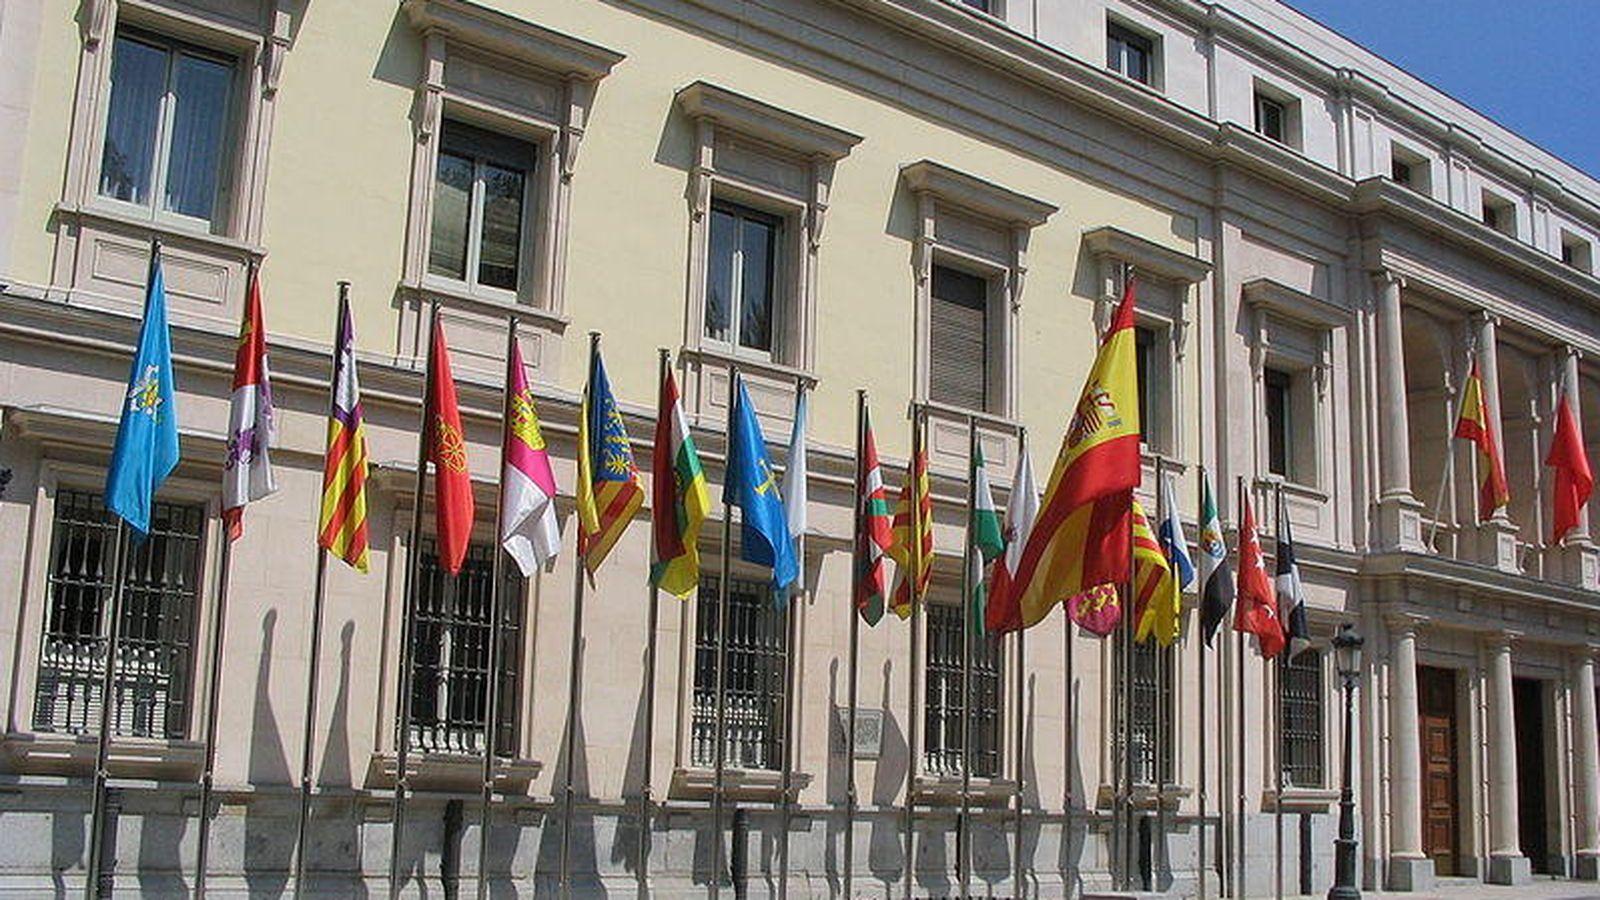 Foto: Banderas de las Comunidades Autónomas frente al Senado (Wikimedia Commons/Javier Carro)